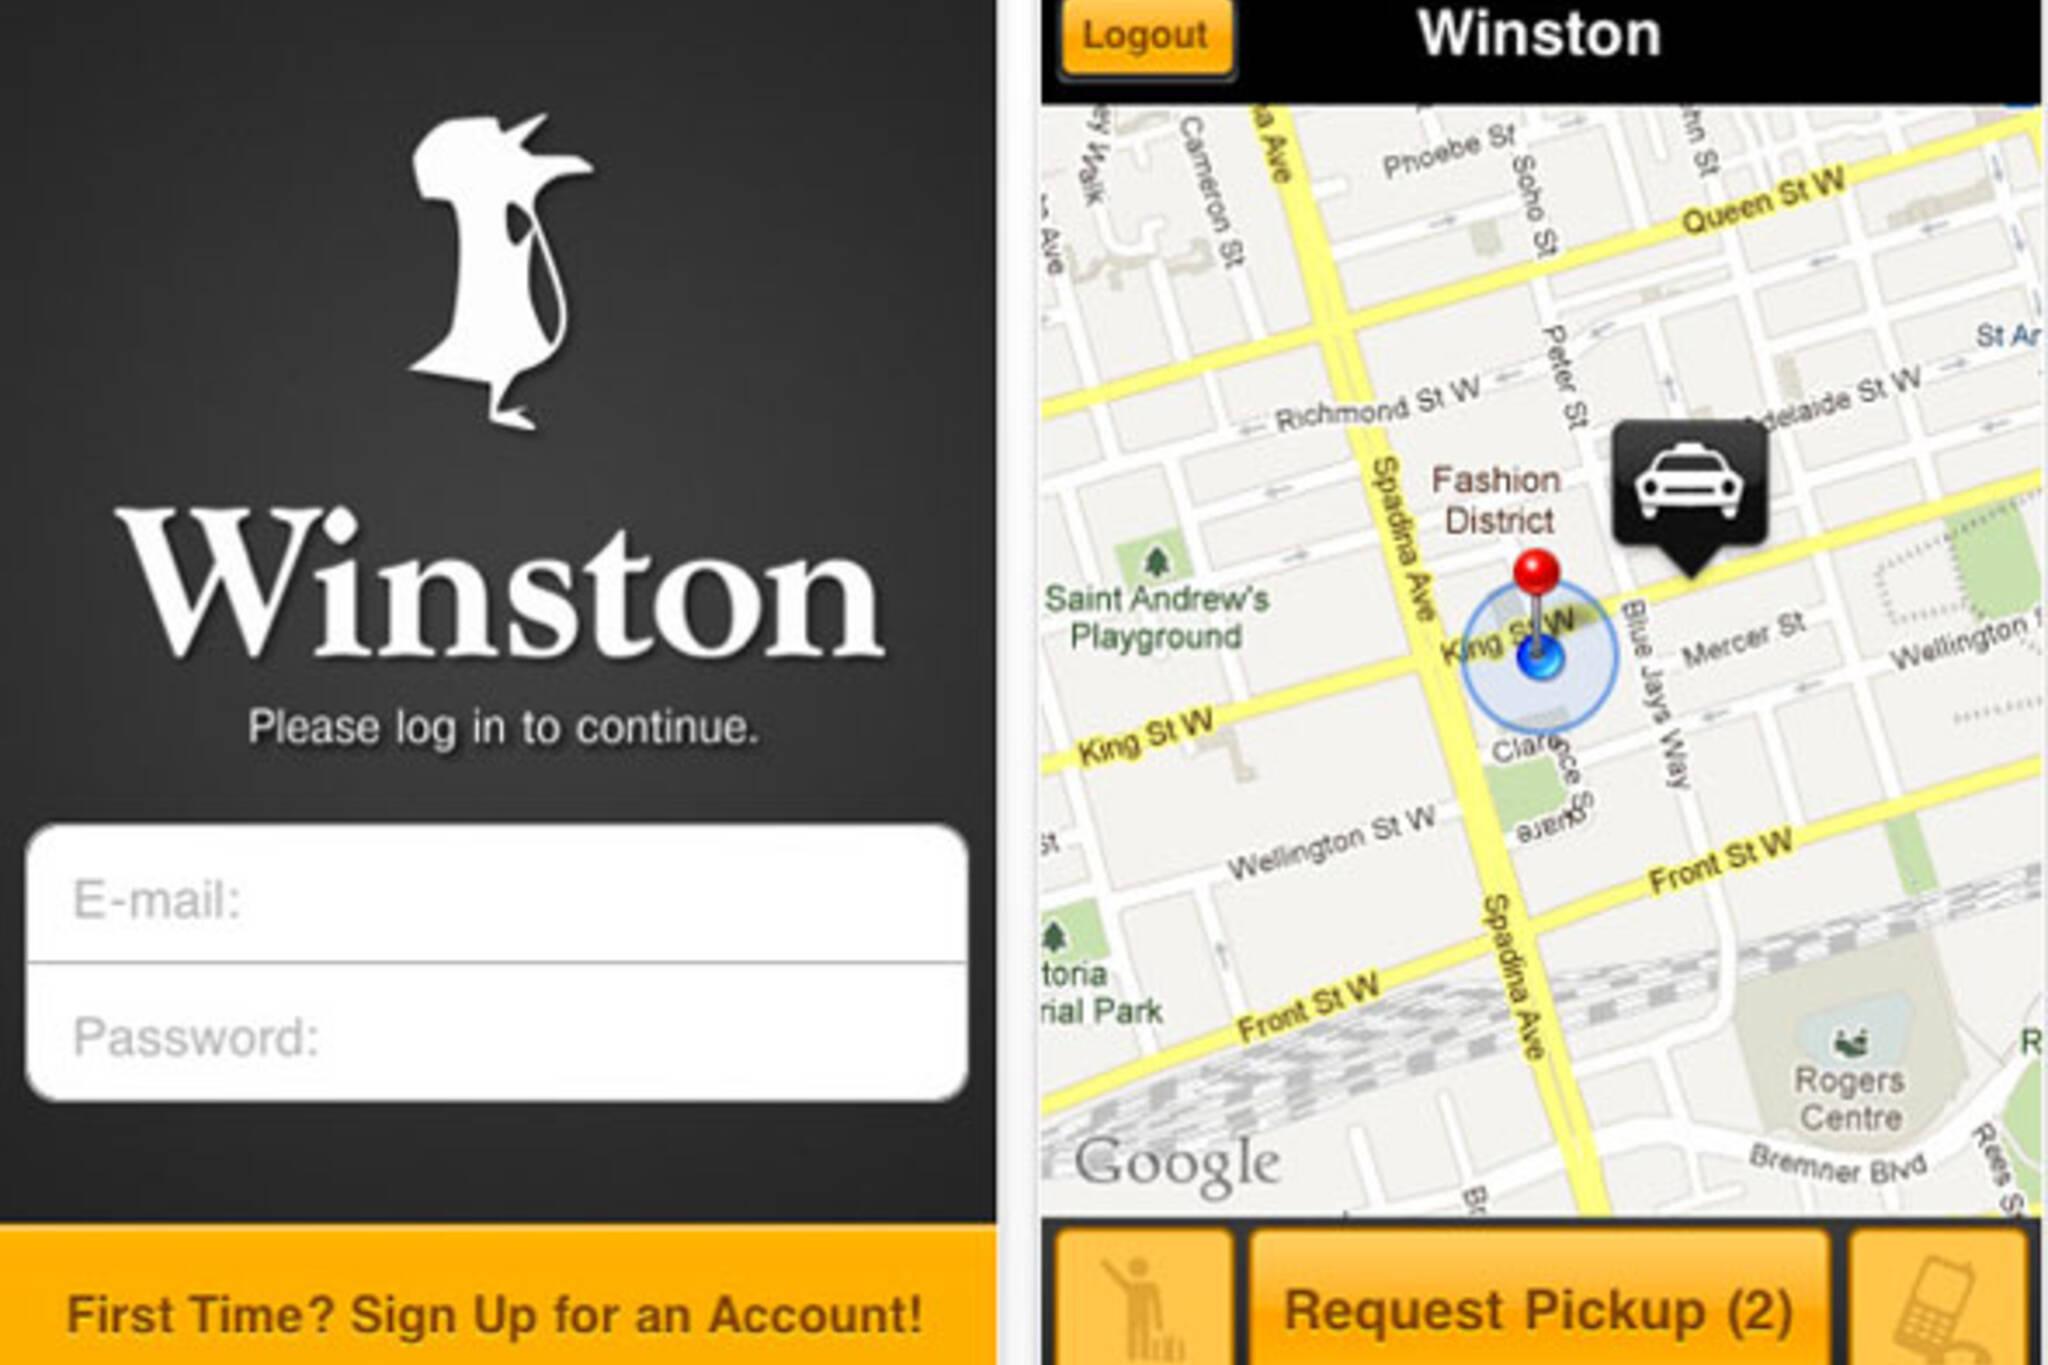 Winston car service Toronto